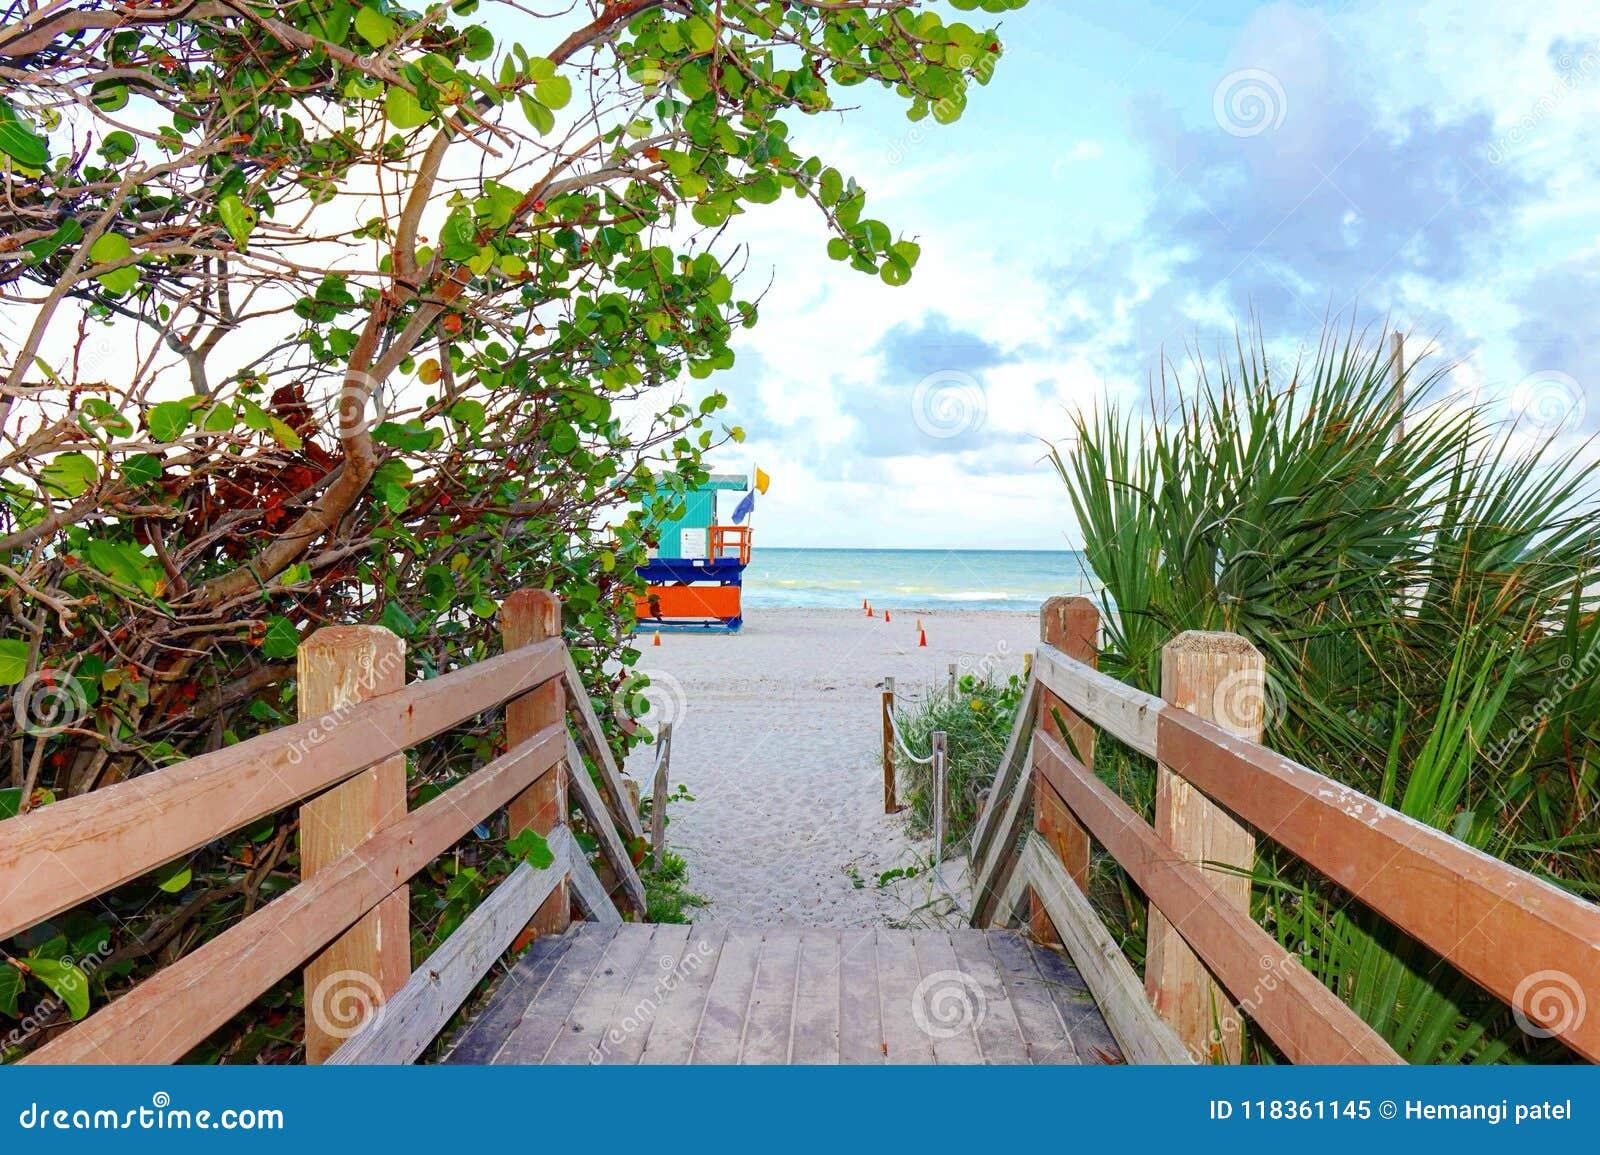 miami beach boardwalk stock image. image of boardwalk